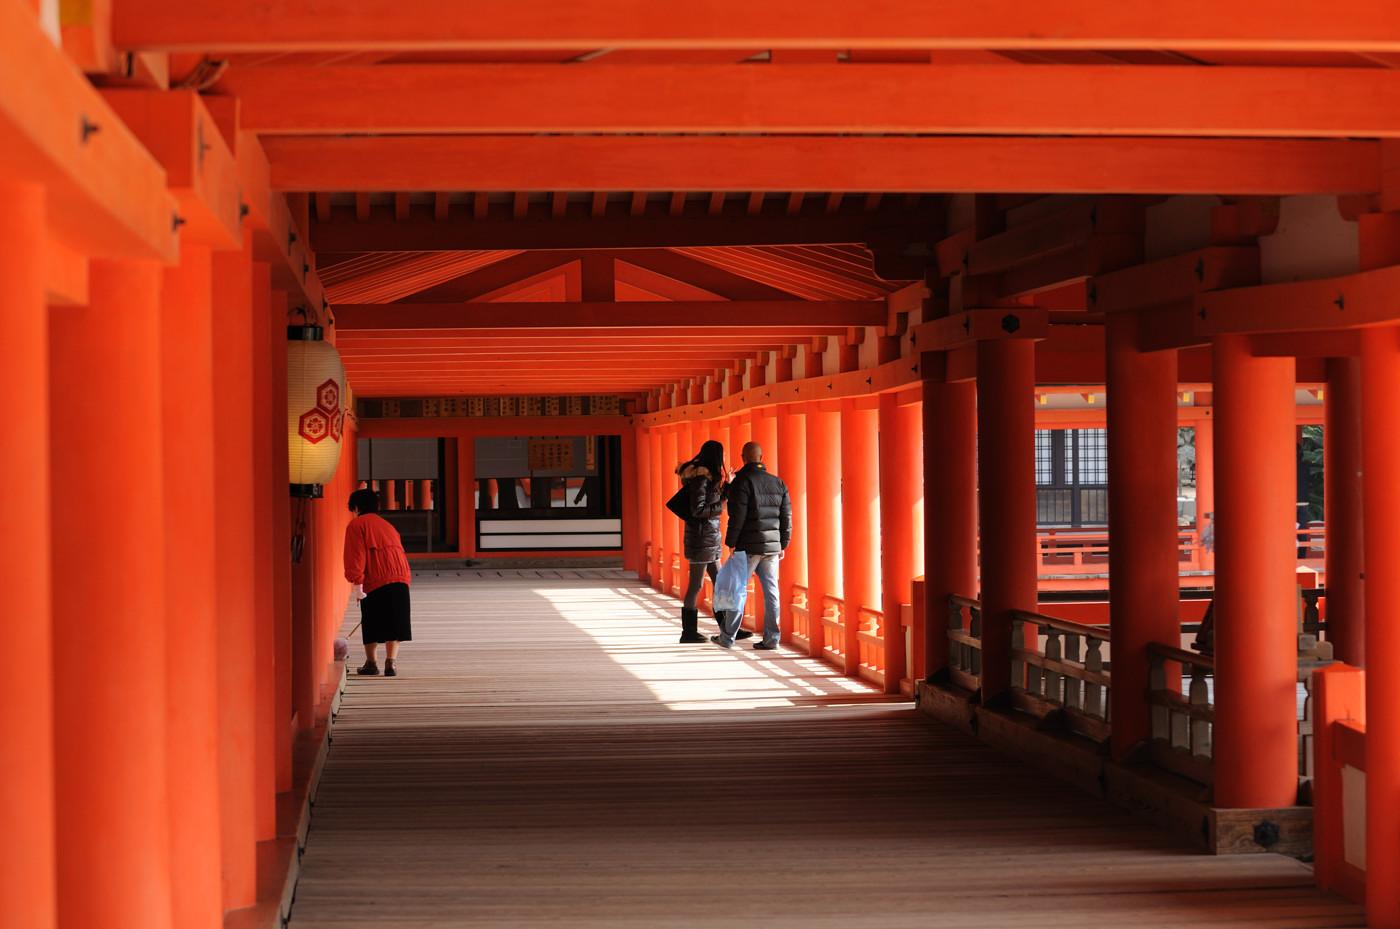 厳島神社内部に潜入